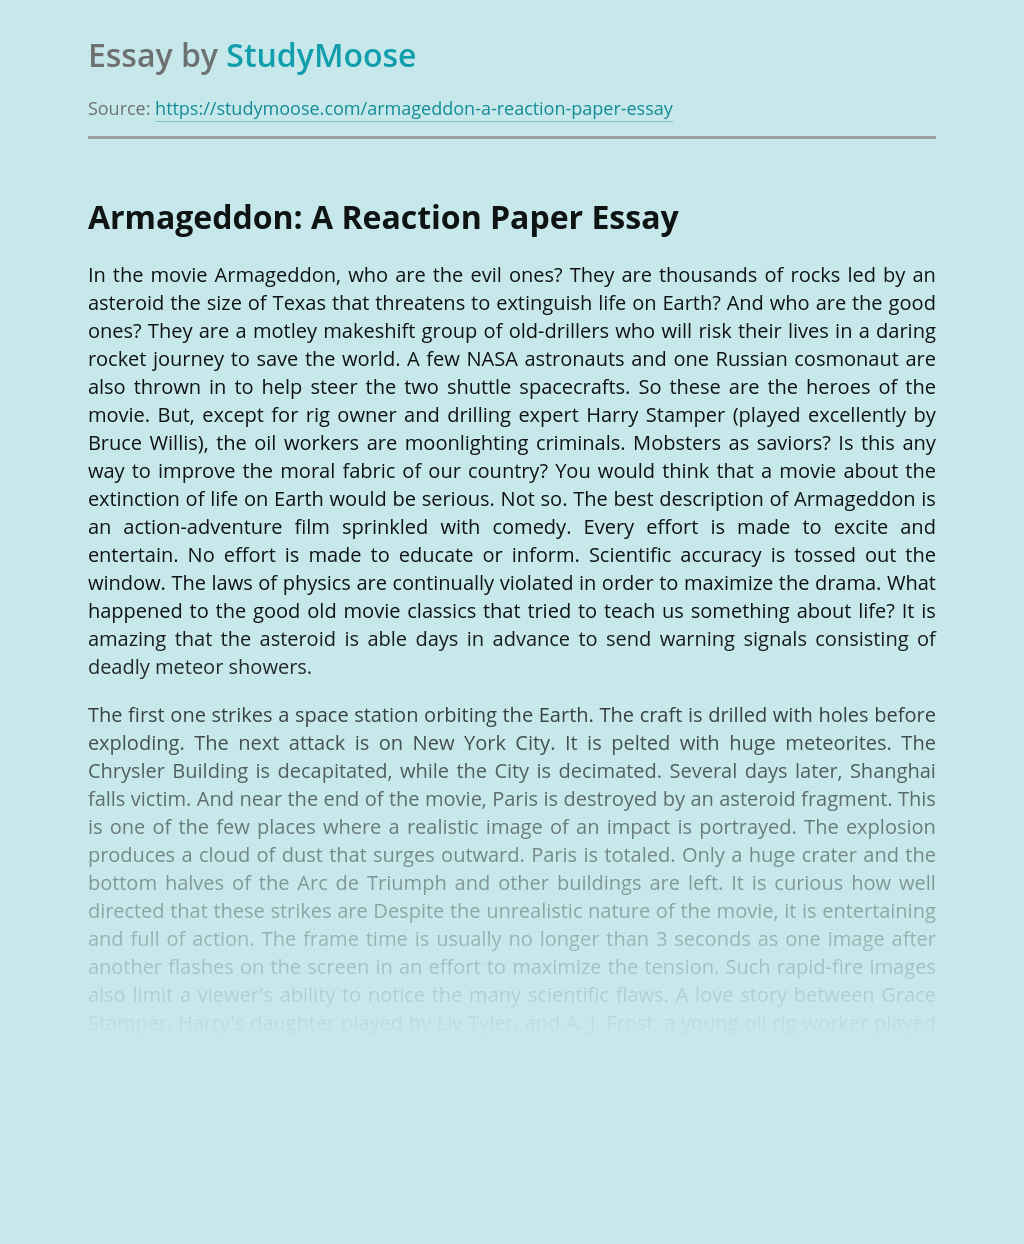 Armageddon: A Reaction Paper